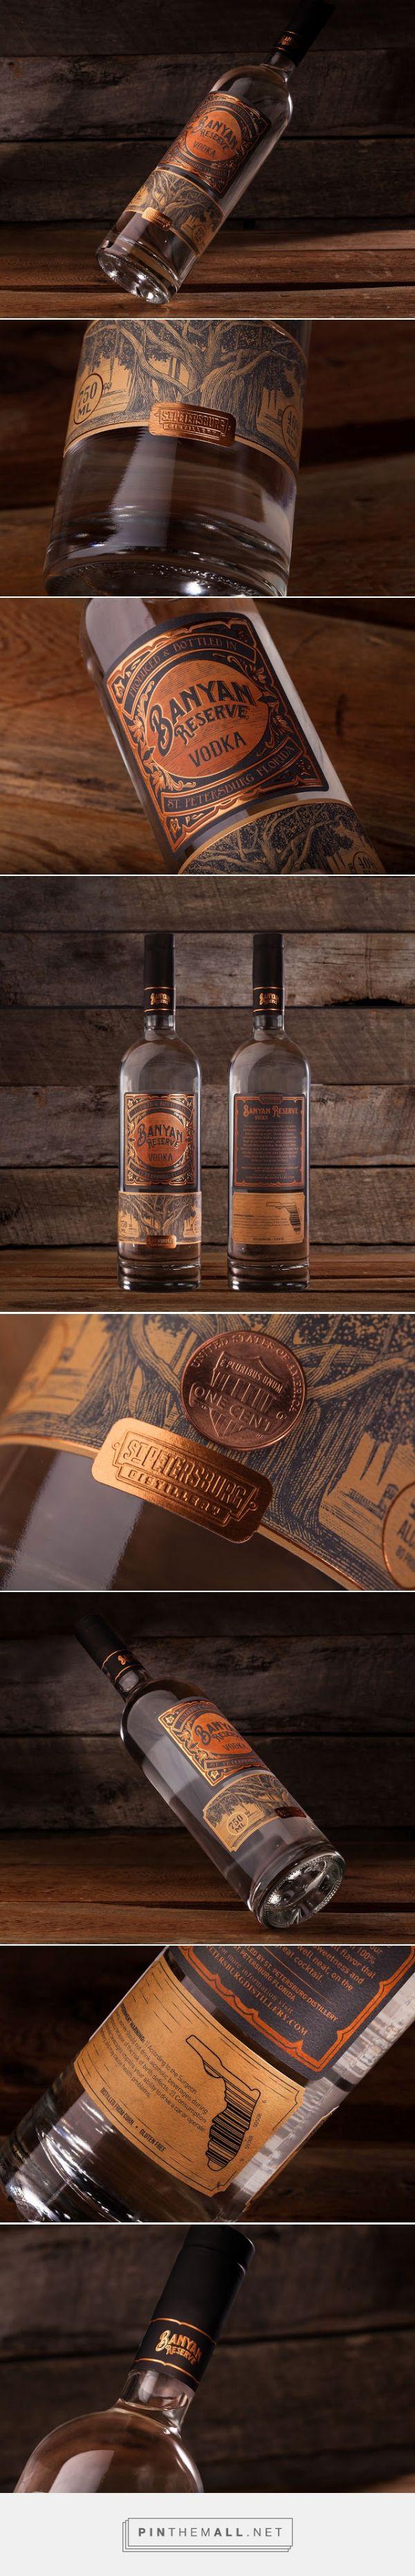 Banyan Reserve #Vodka #packaging designed by Dunn&Co. - http://www.packagingoftheworld.com/2015/07/banyan-reserve-vodka.html